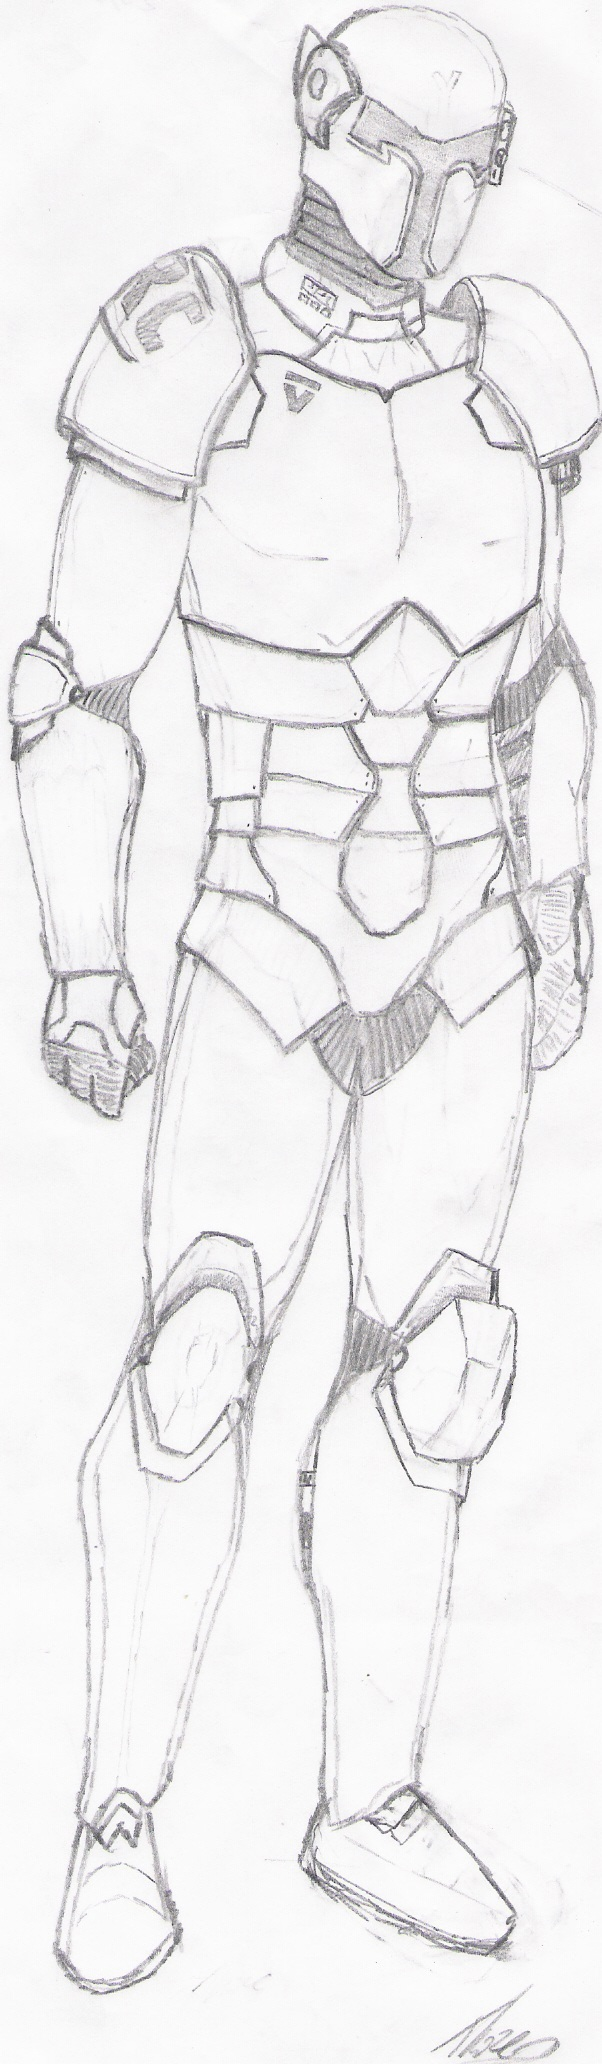 Simple armor